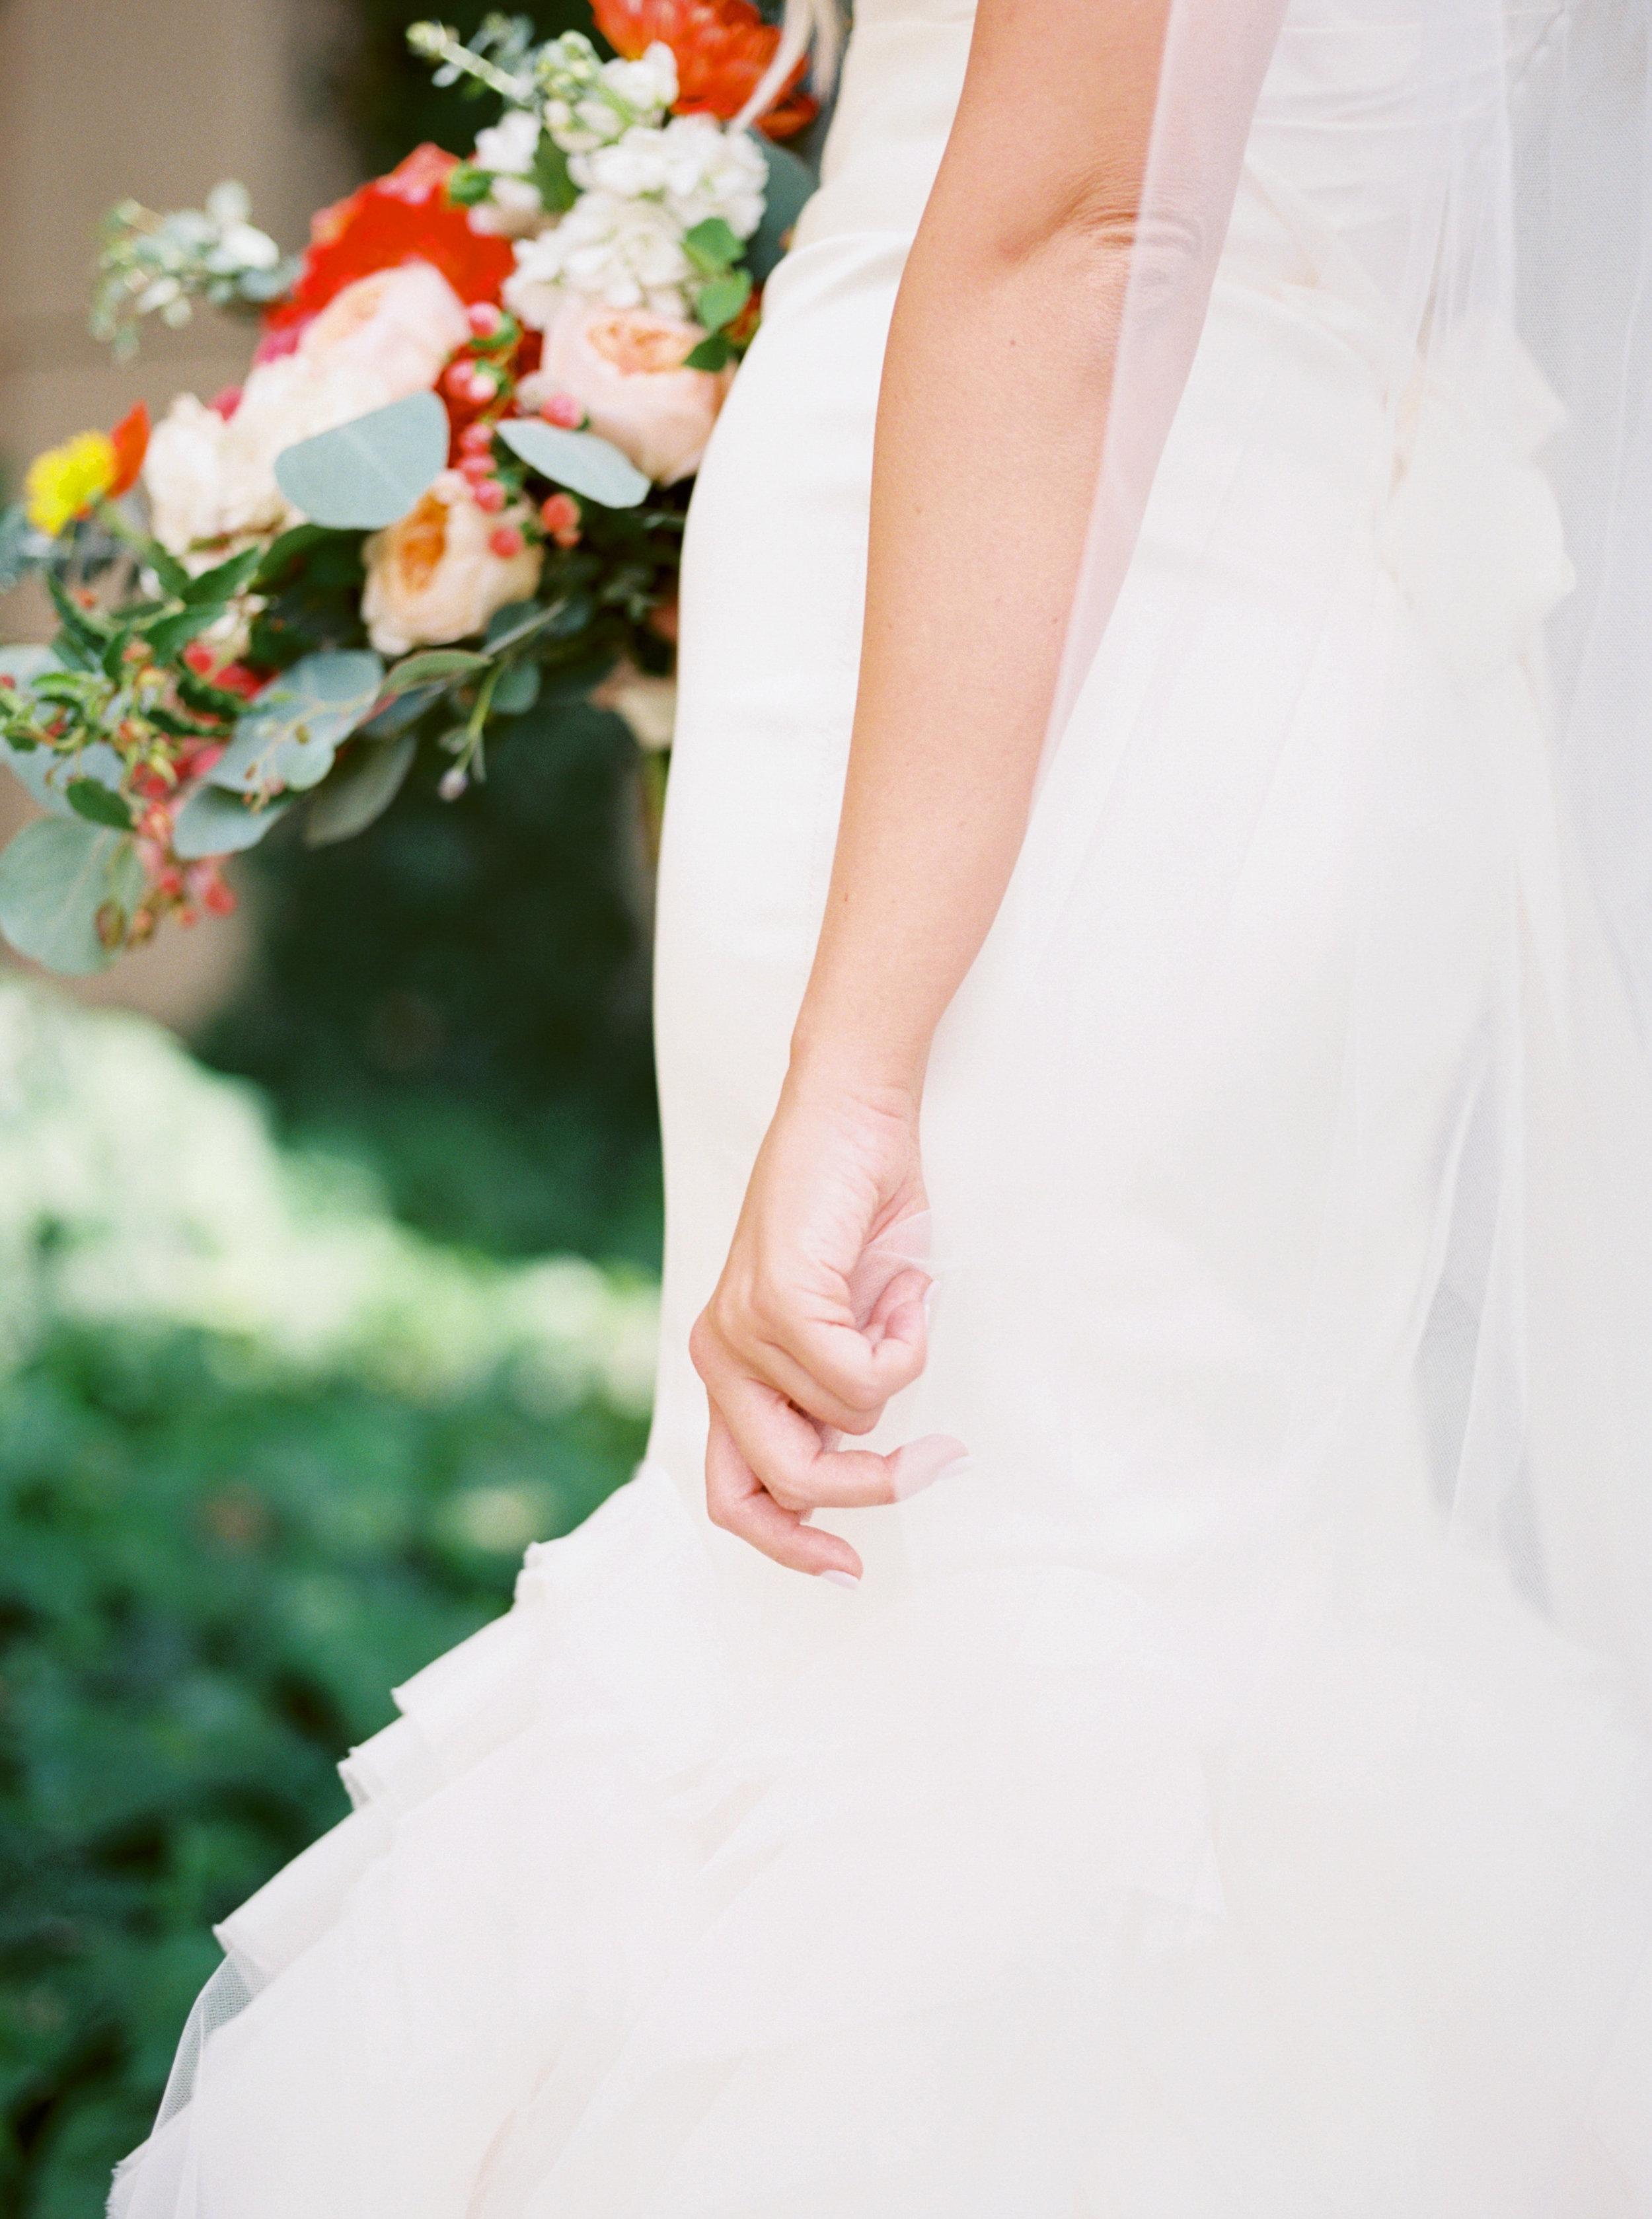 Bride details, bridal veil, wedding dress, Vera Wang wedding dress, engagement ring, bridal bouquet, coral wedding flowers, orange wedding flowers, blush wedding flowers